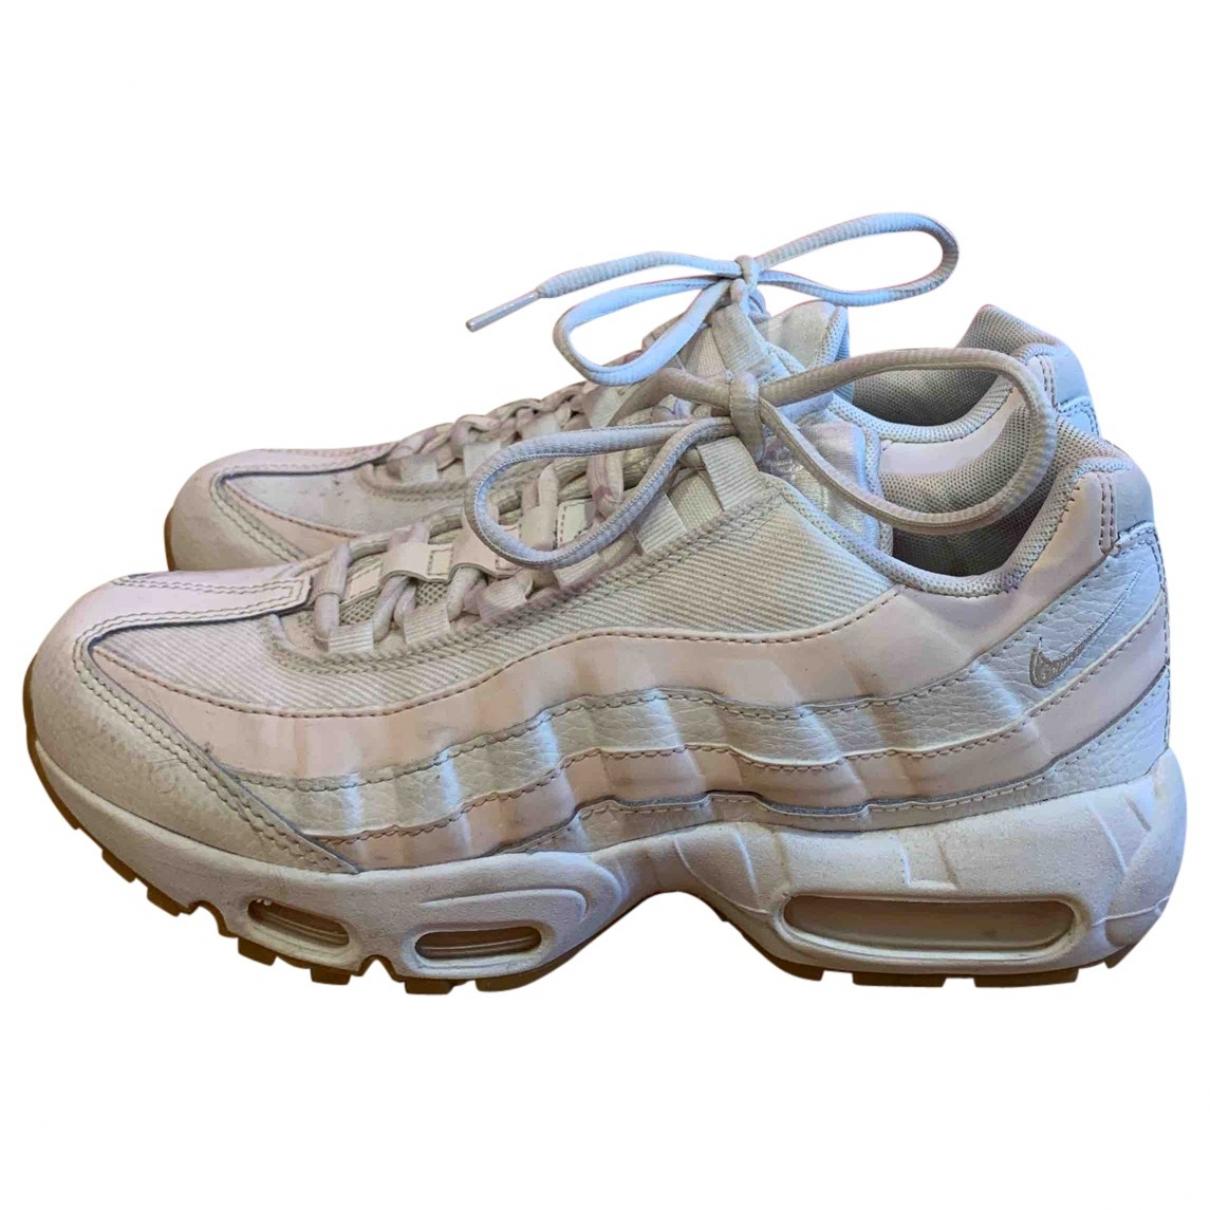 Nike Air Max 95 White Cloth Trainers for Women 38.5 EU